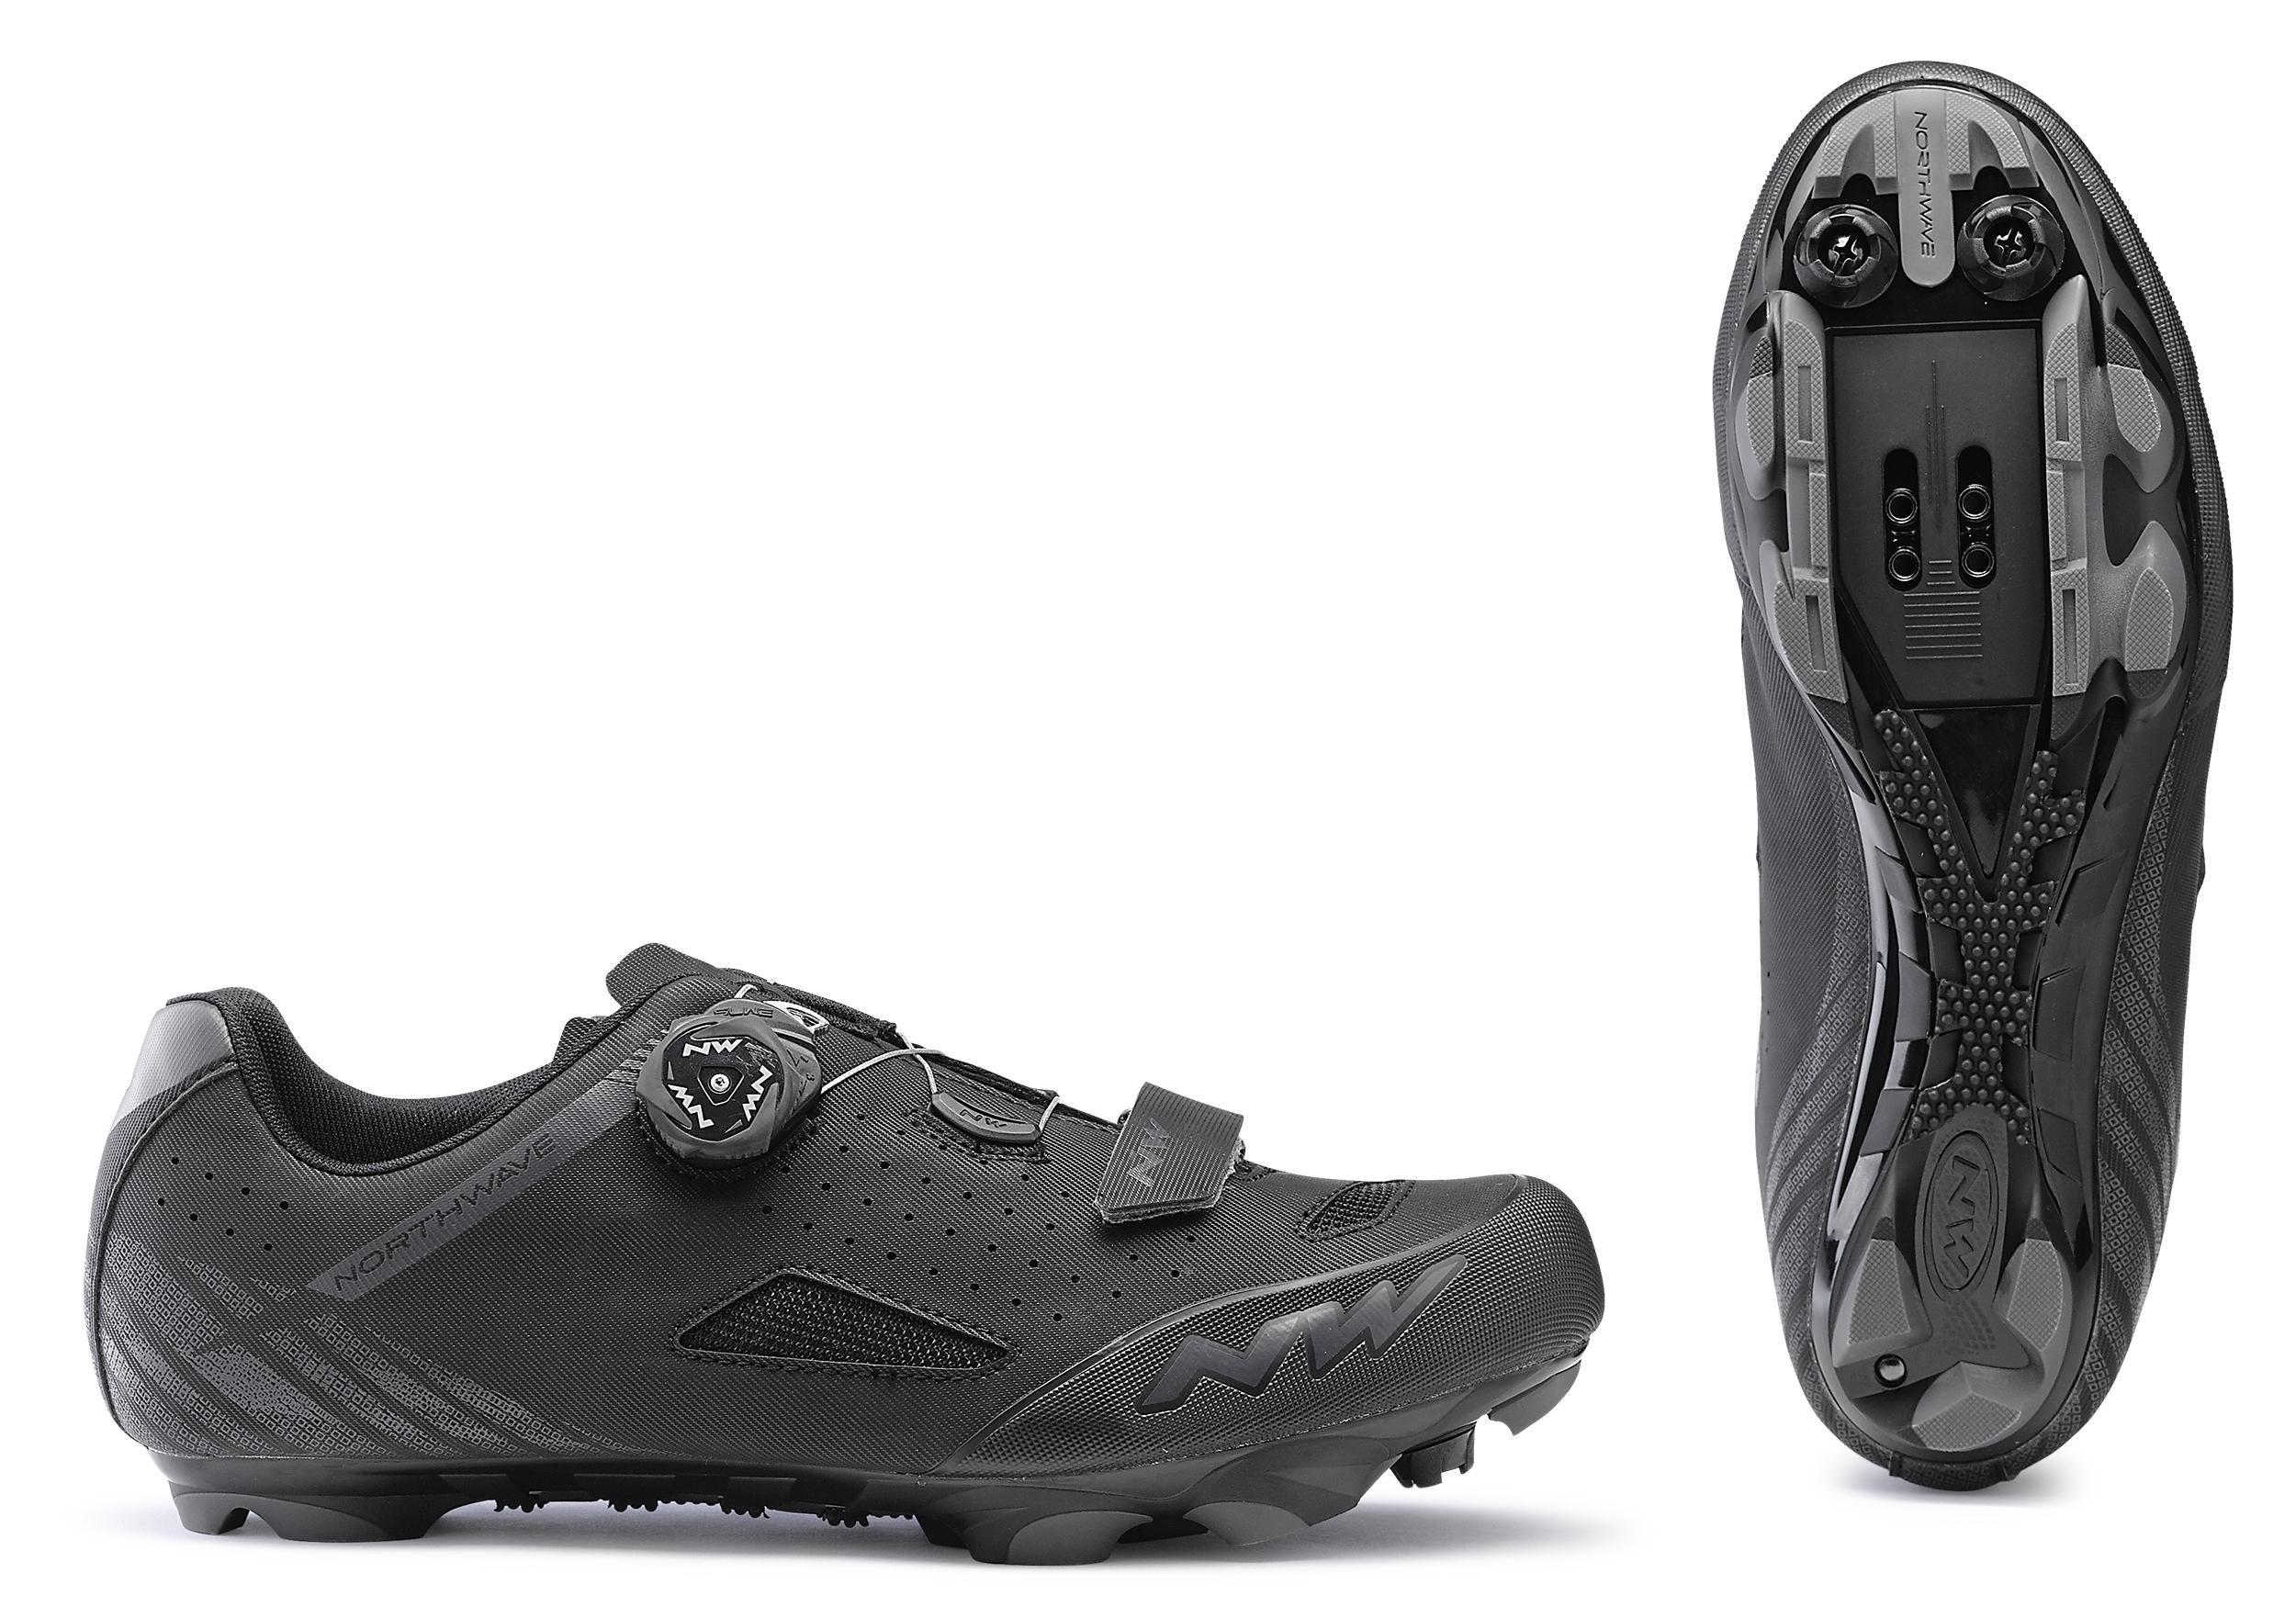 Best price Northwave BIke cross country shoes Origin Plus